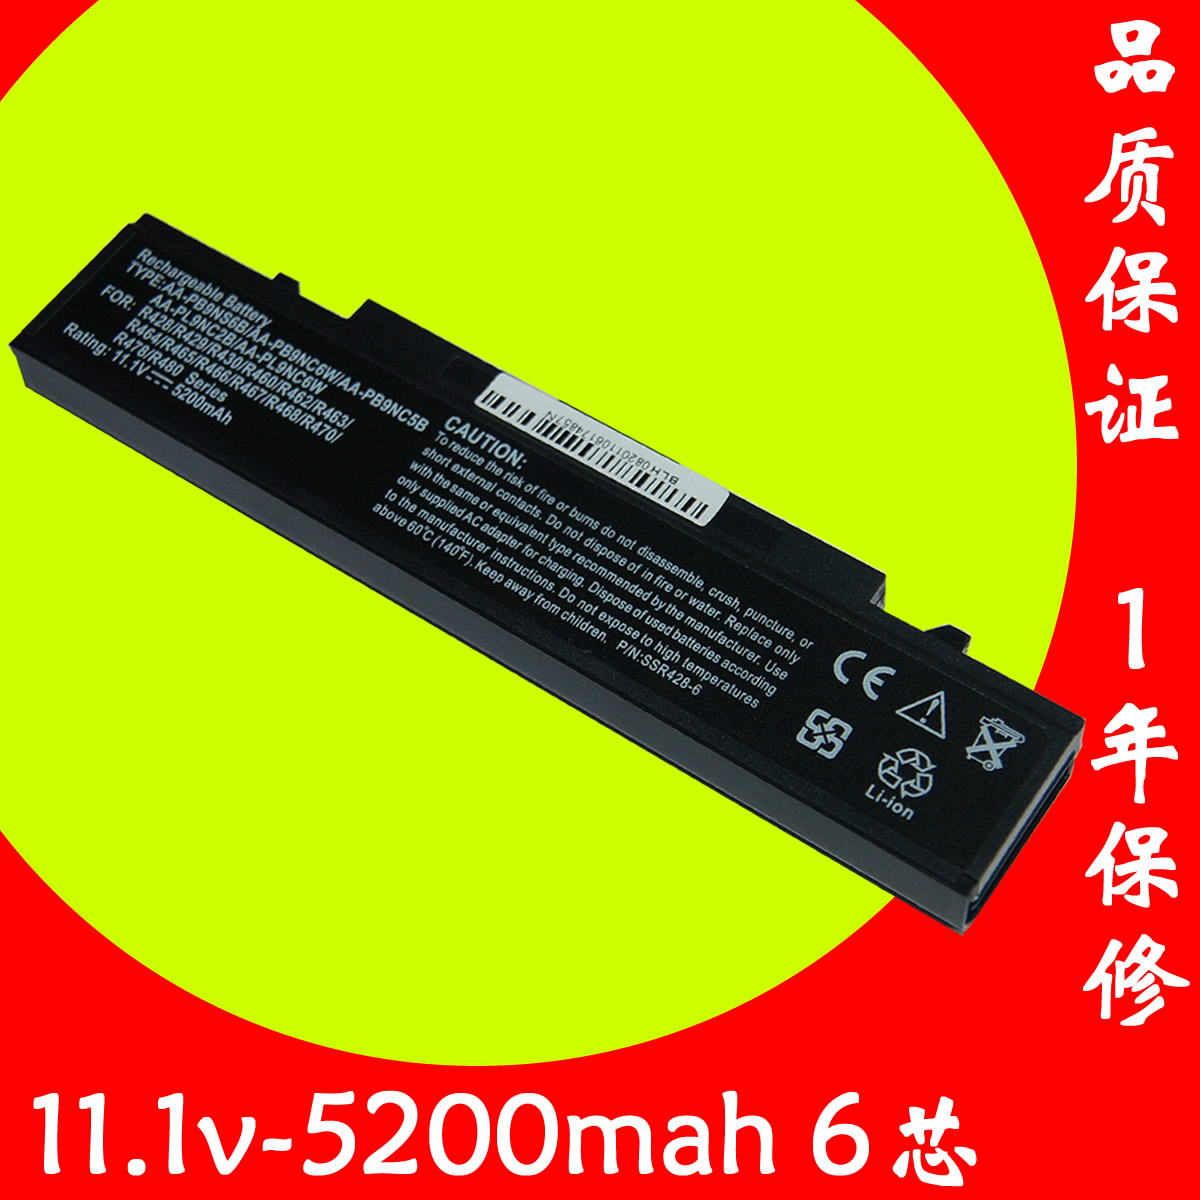 �m用于Samsung 三星 R523 R538 R540 R580 R620 R718 R720 �池